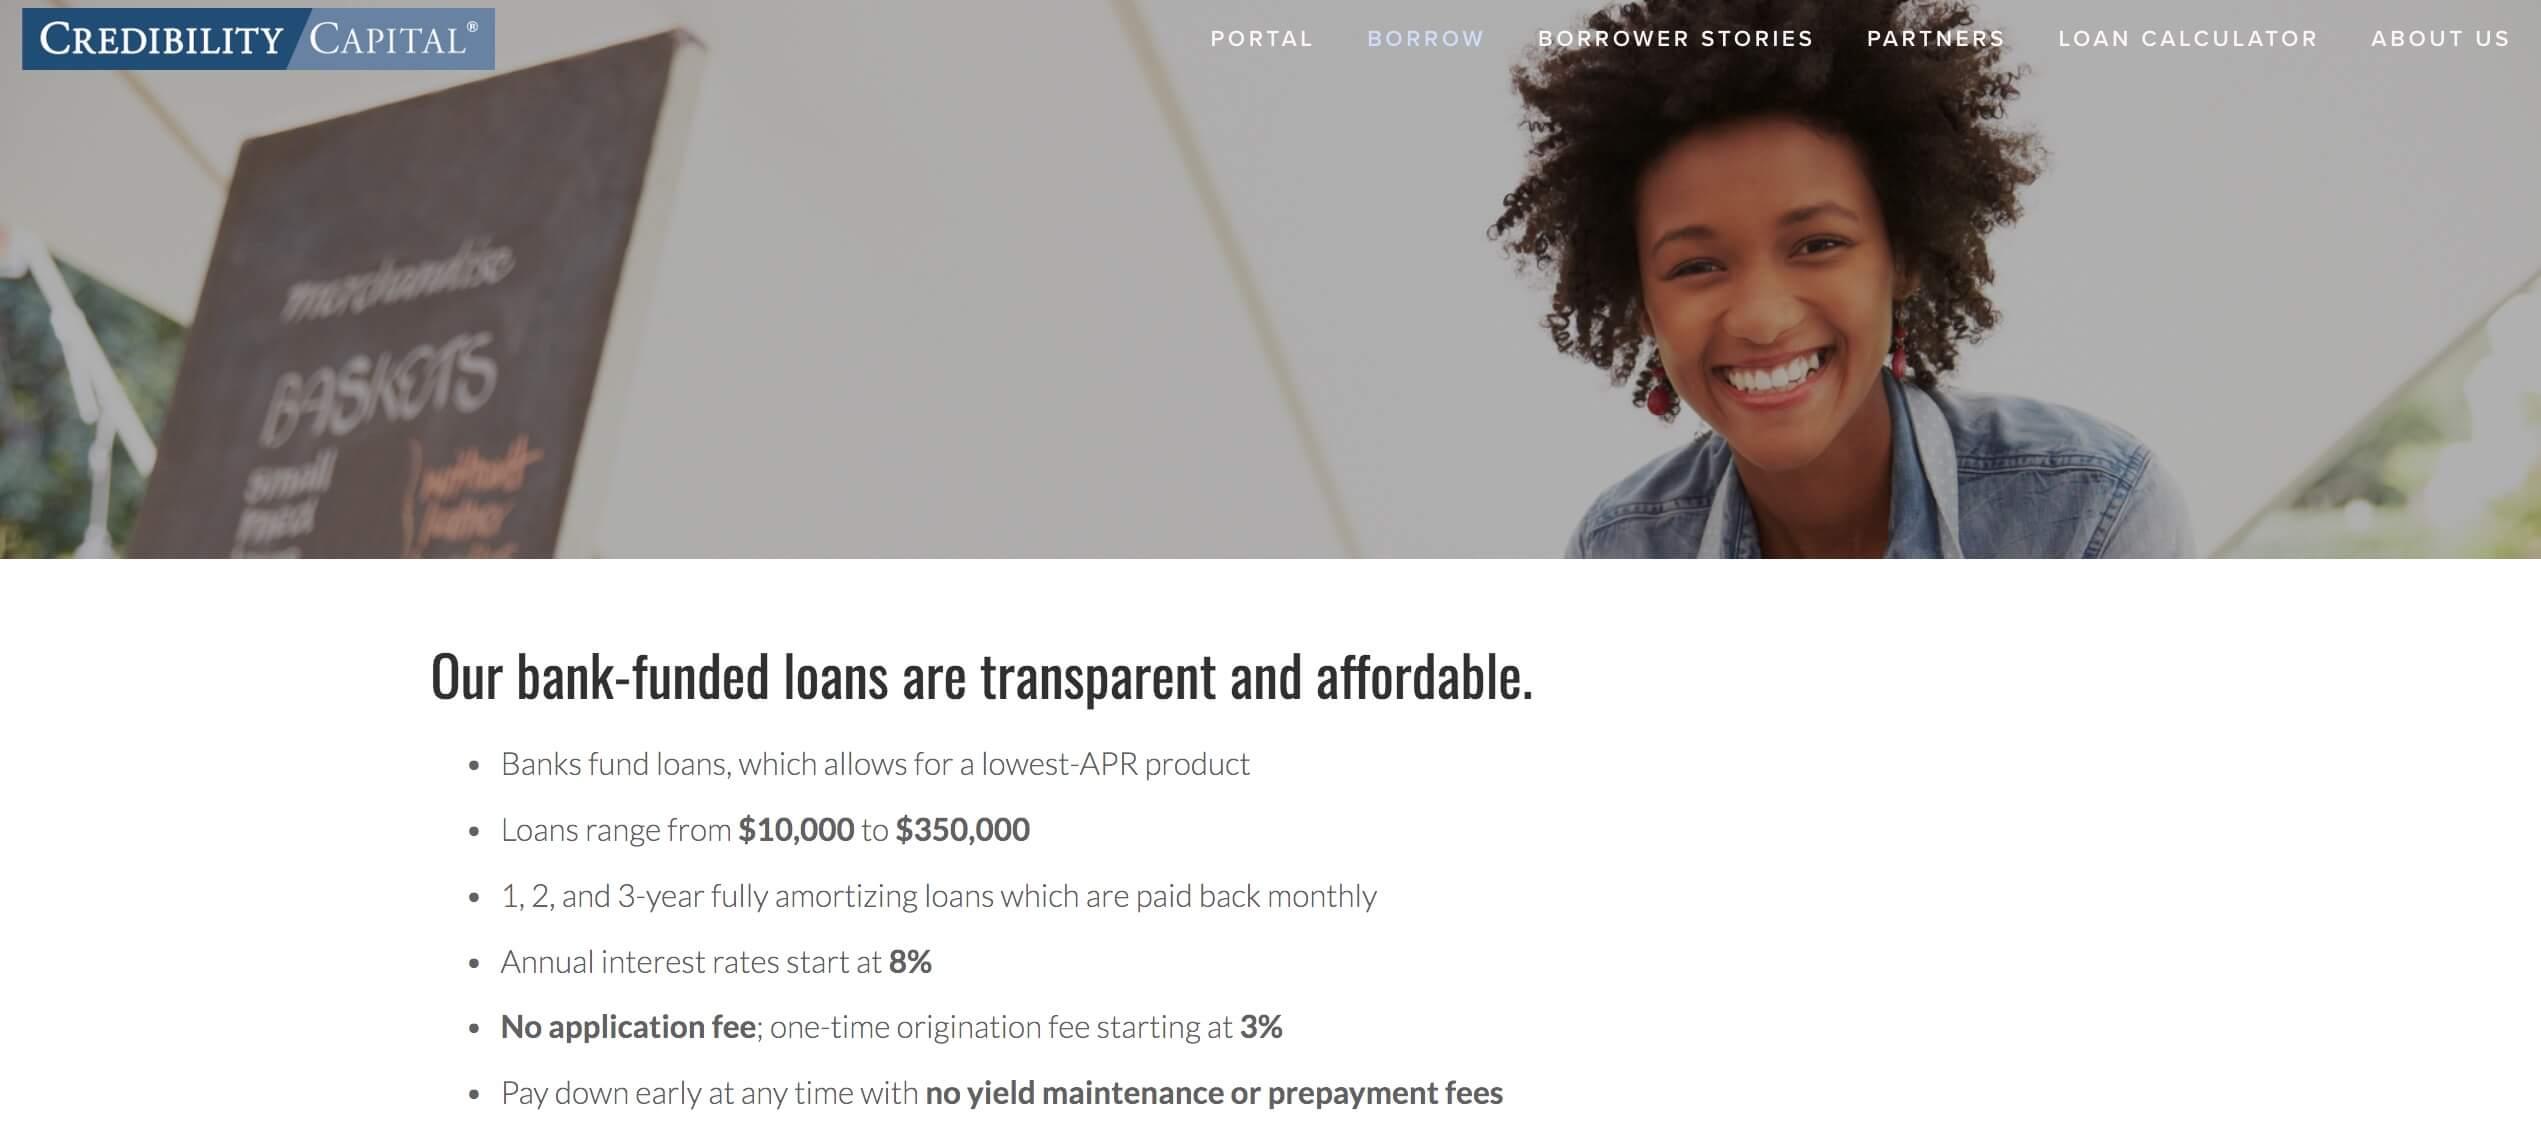 credibility capital loans